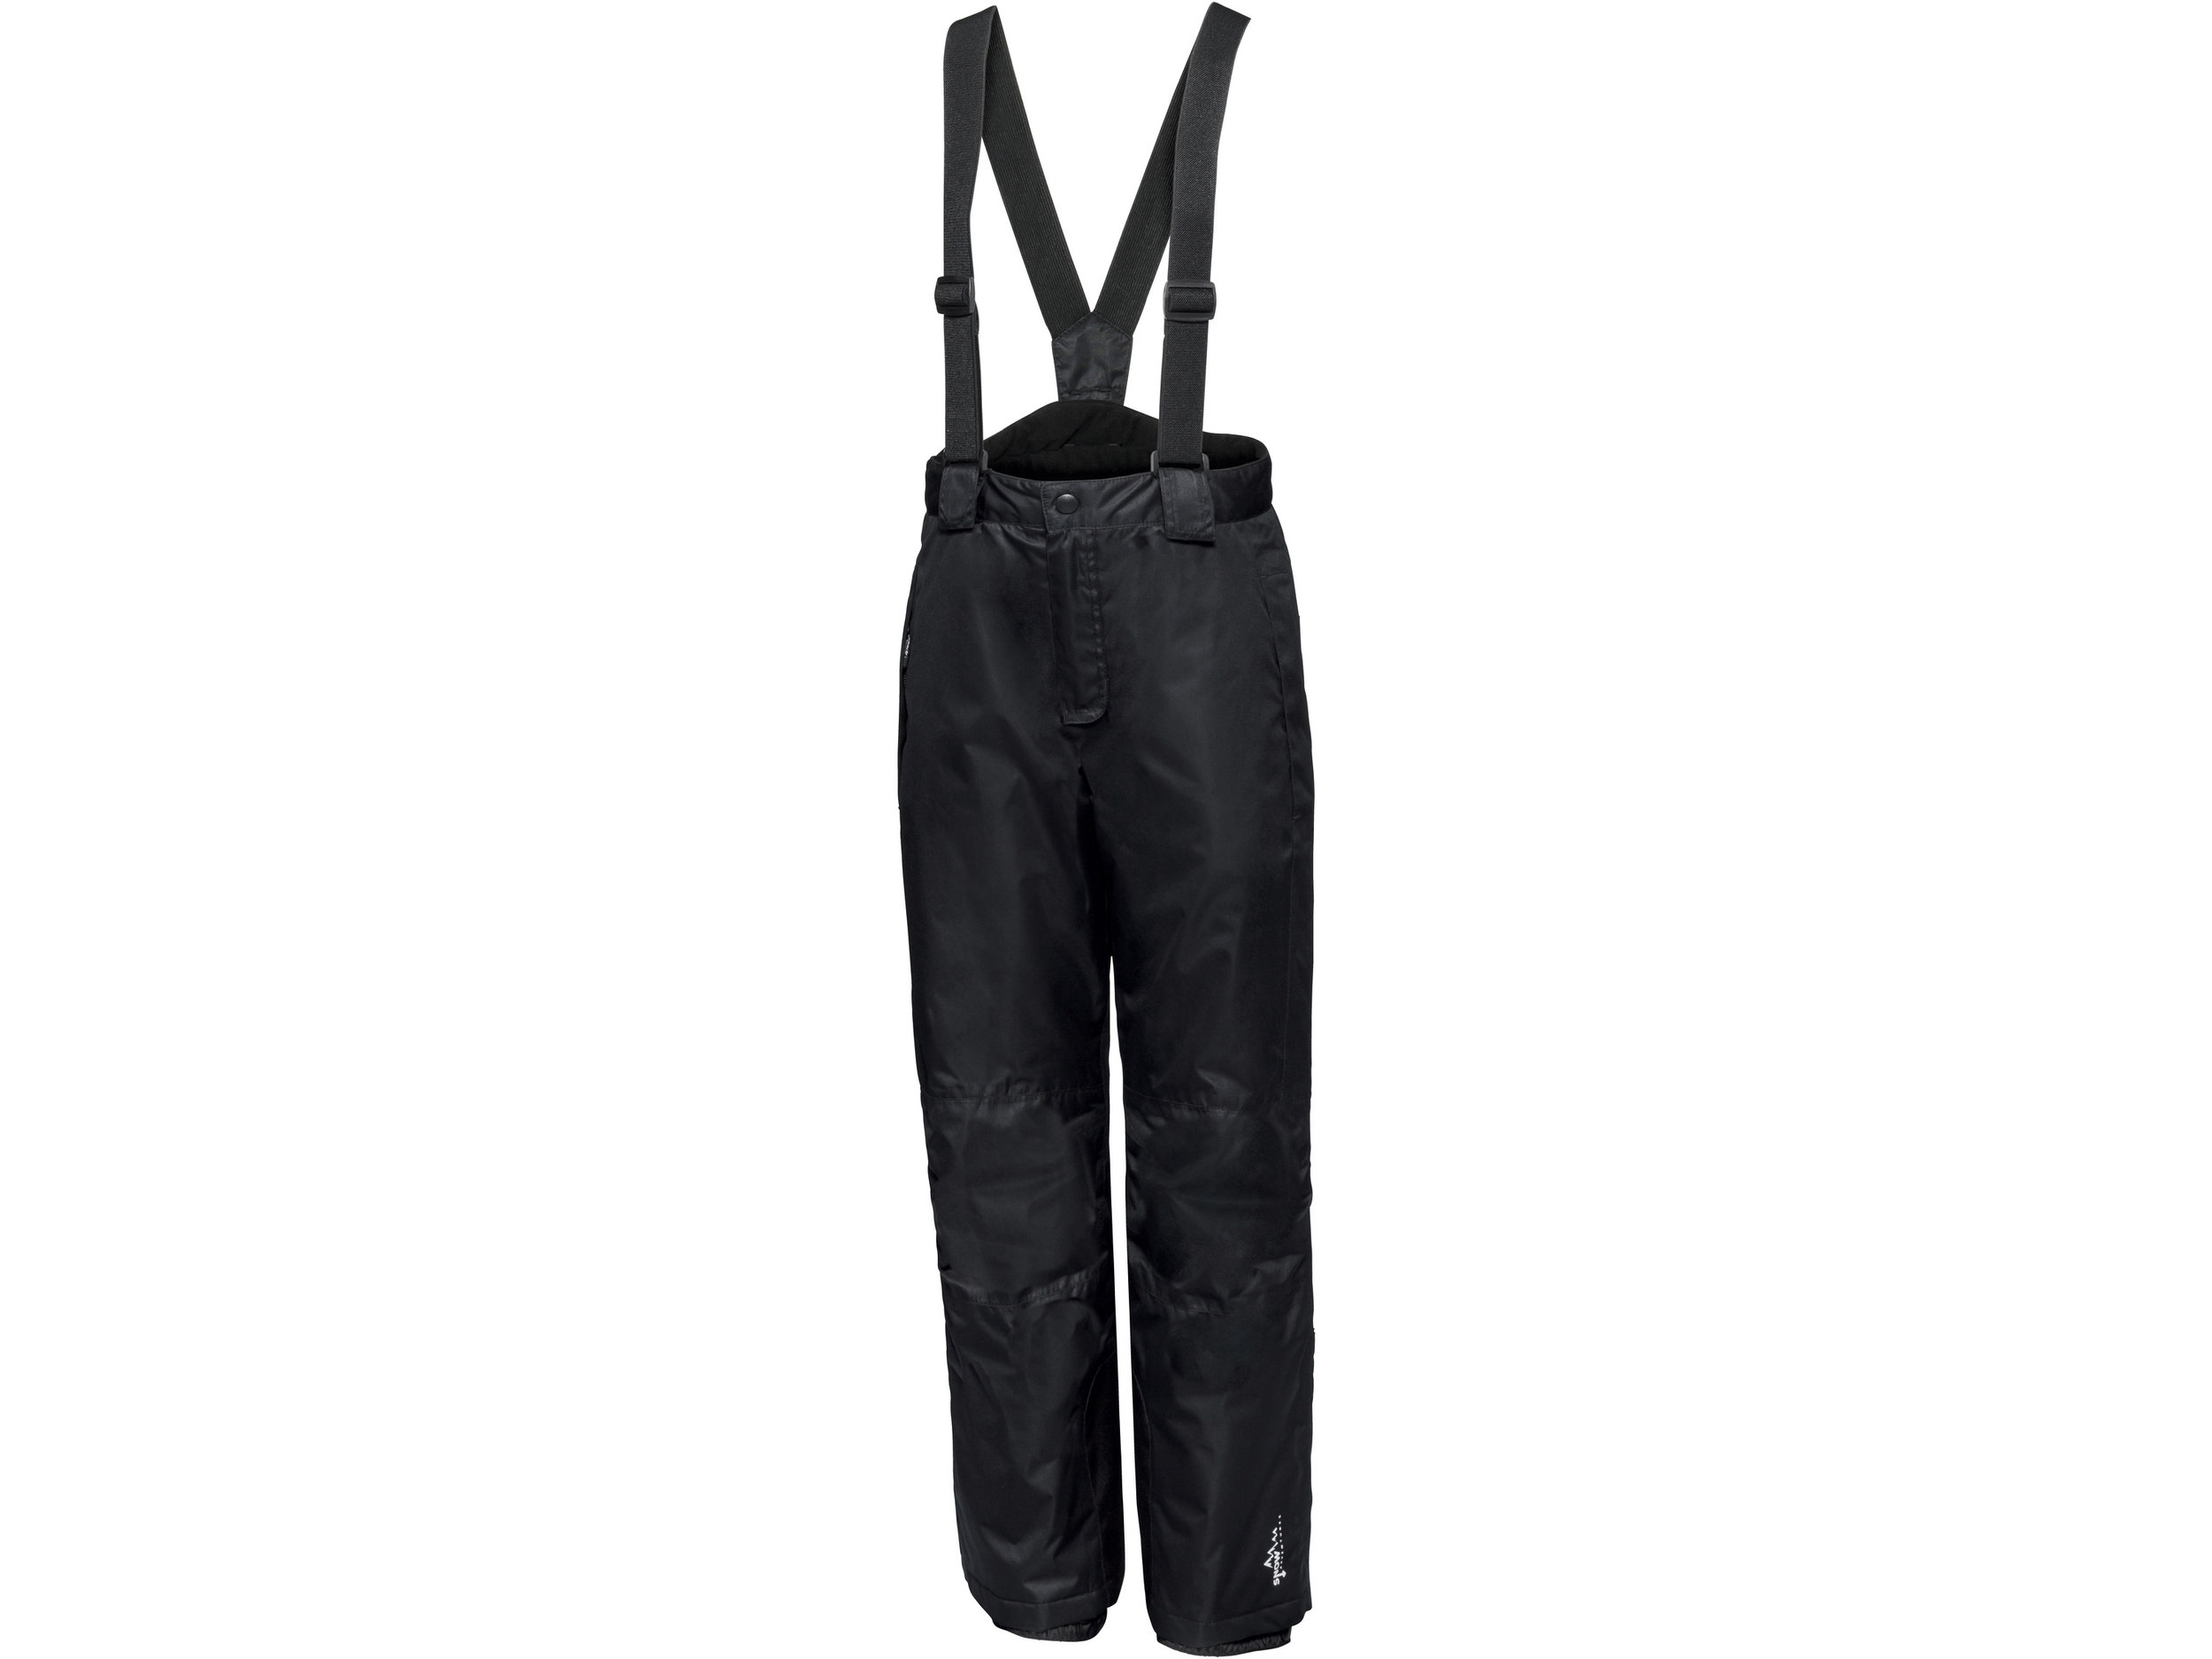 Boys' Ski Trousers £9.99 - Black (1).JPG